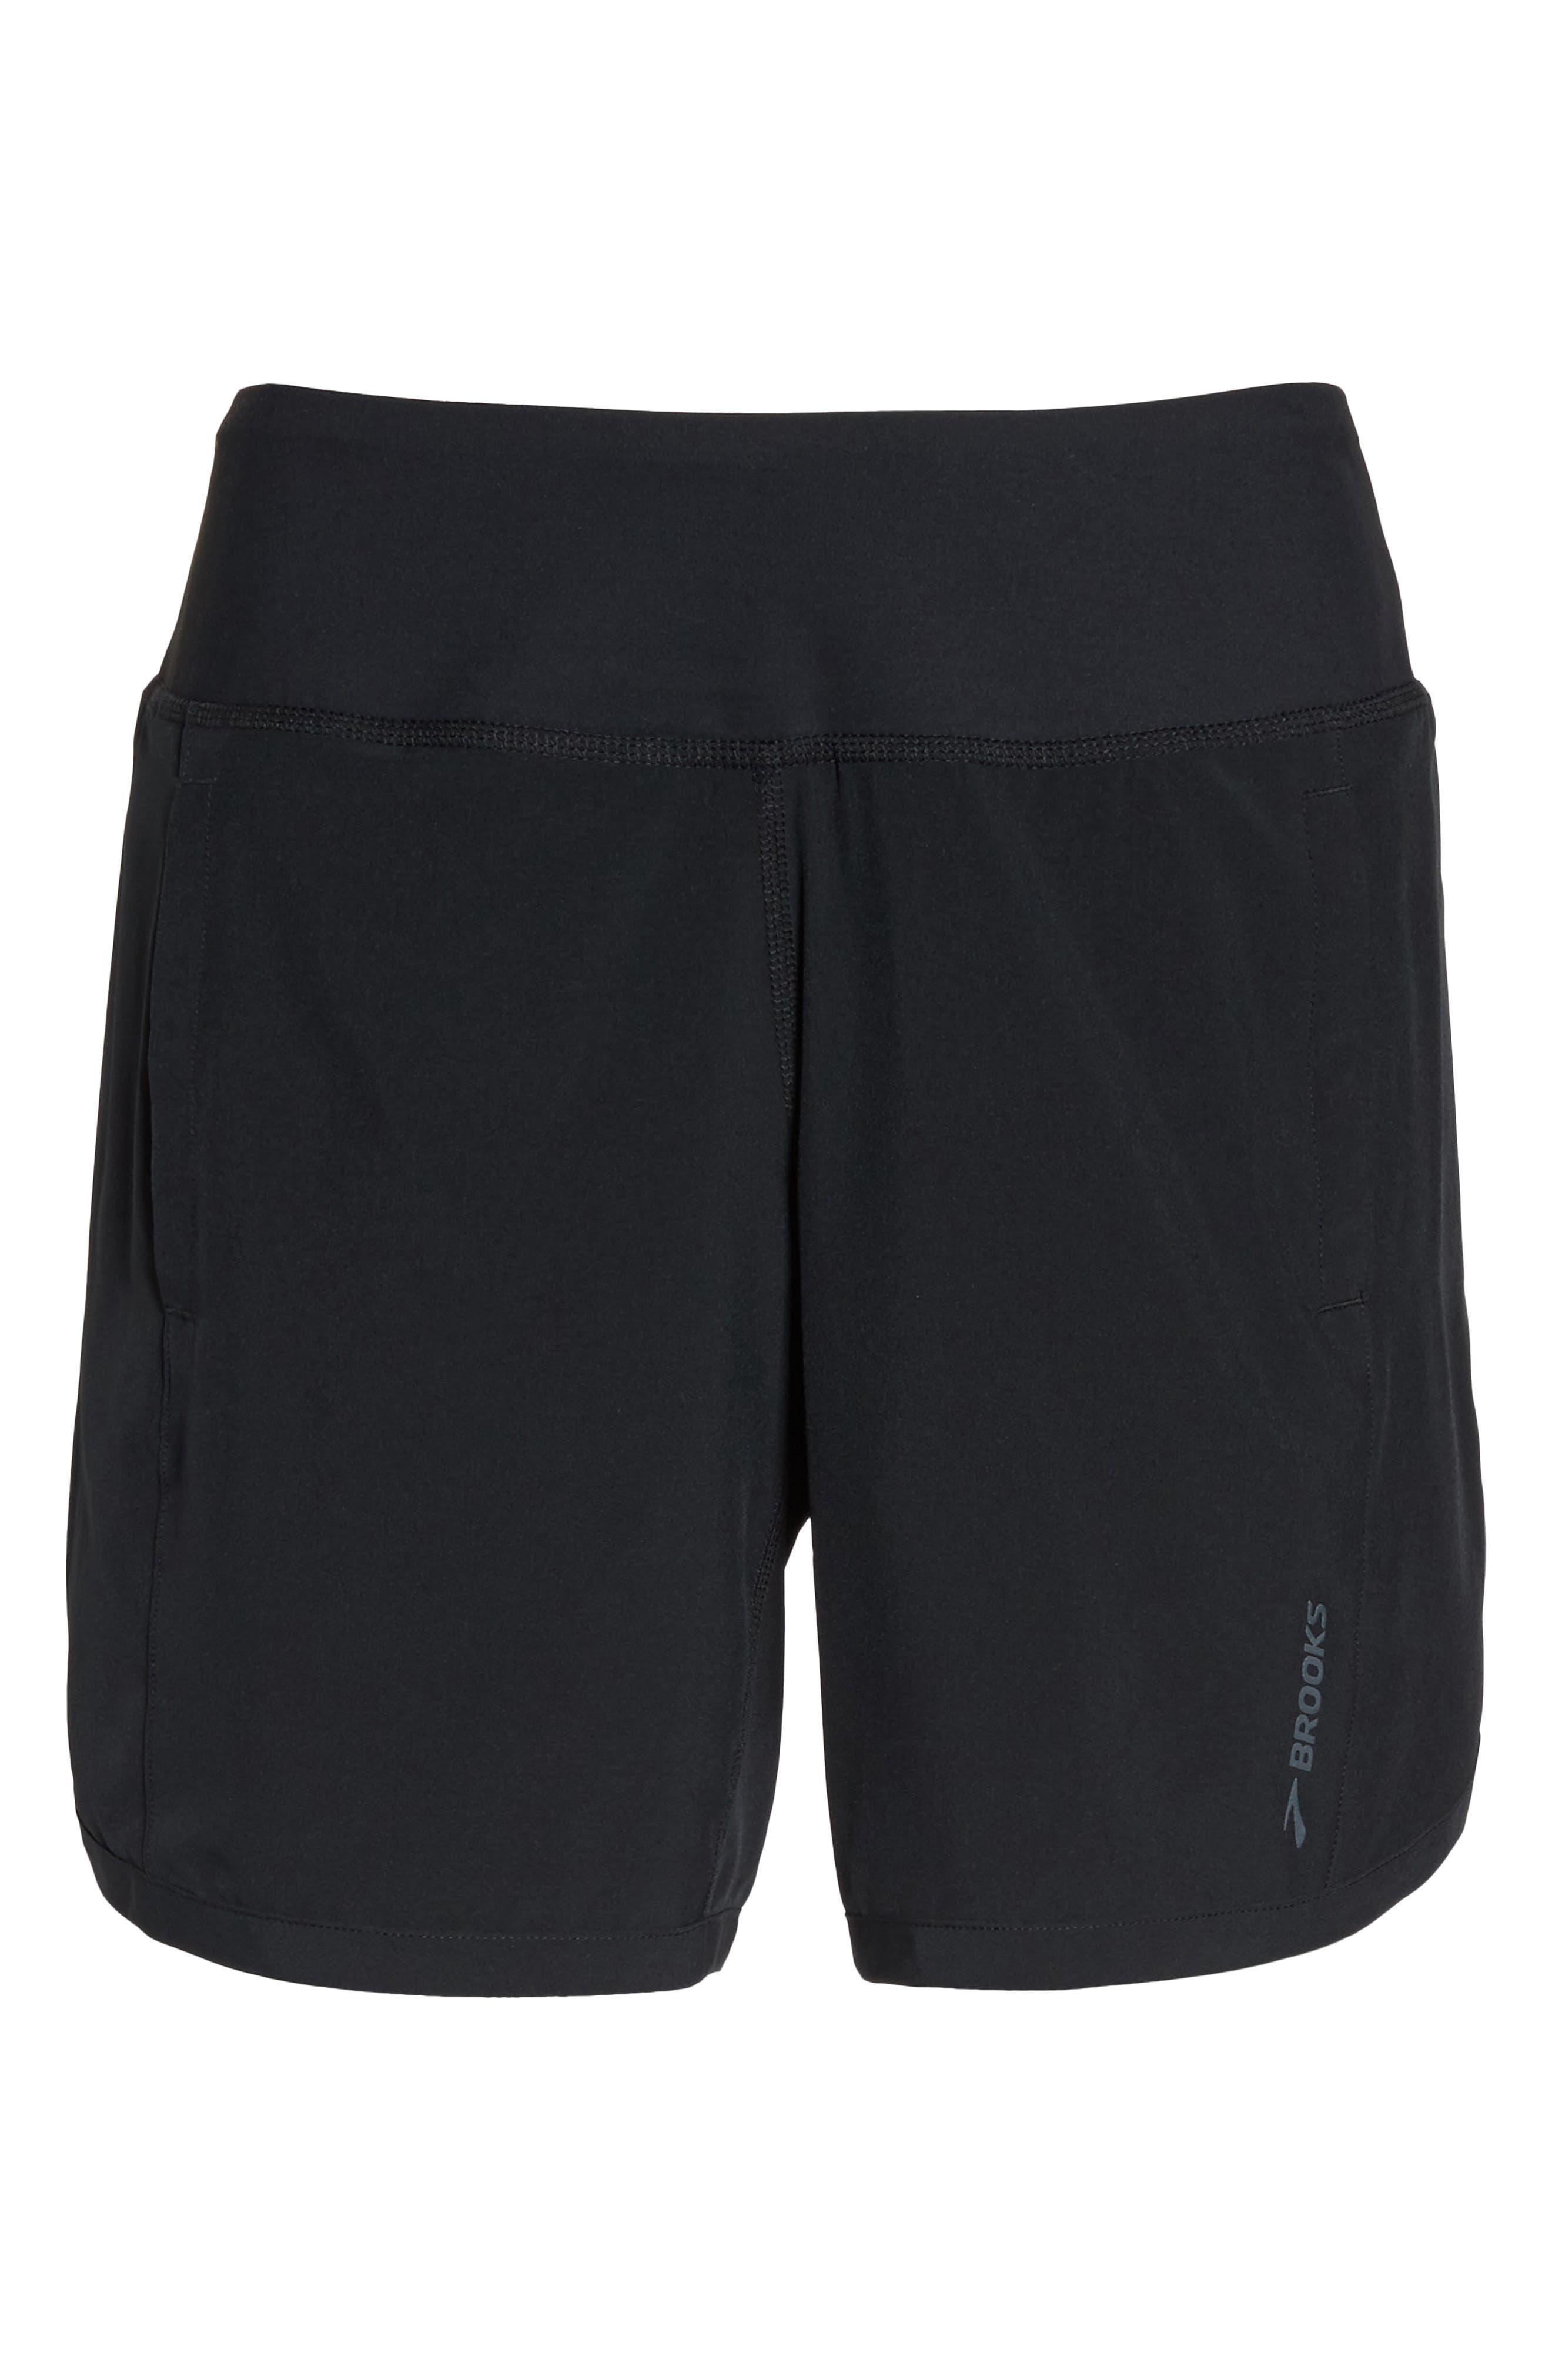 Chaser 7 Shorts,                             Alternate thumbnail 7, color,                             Black